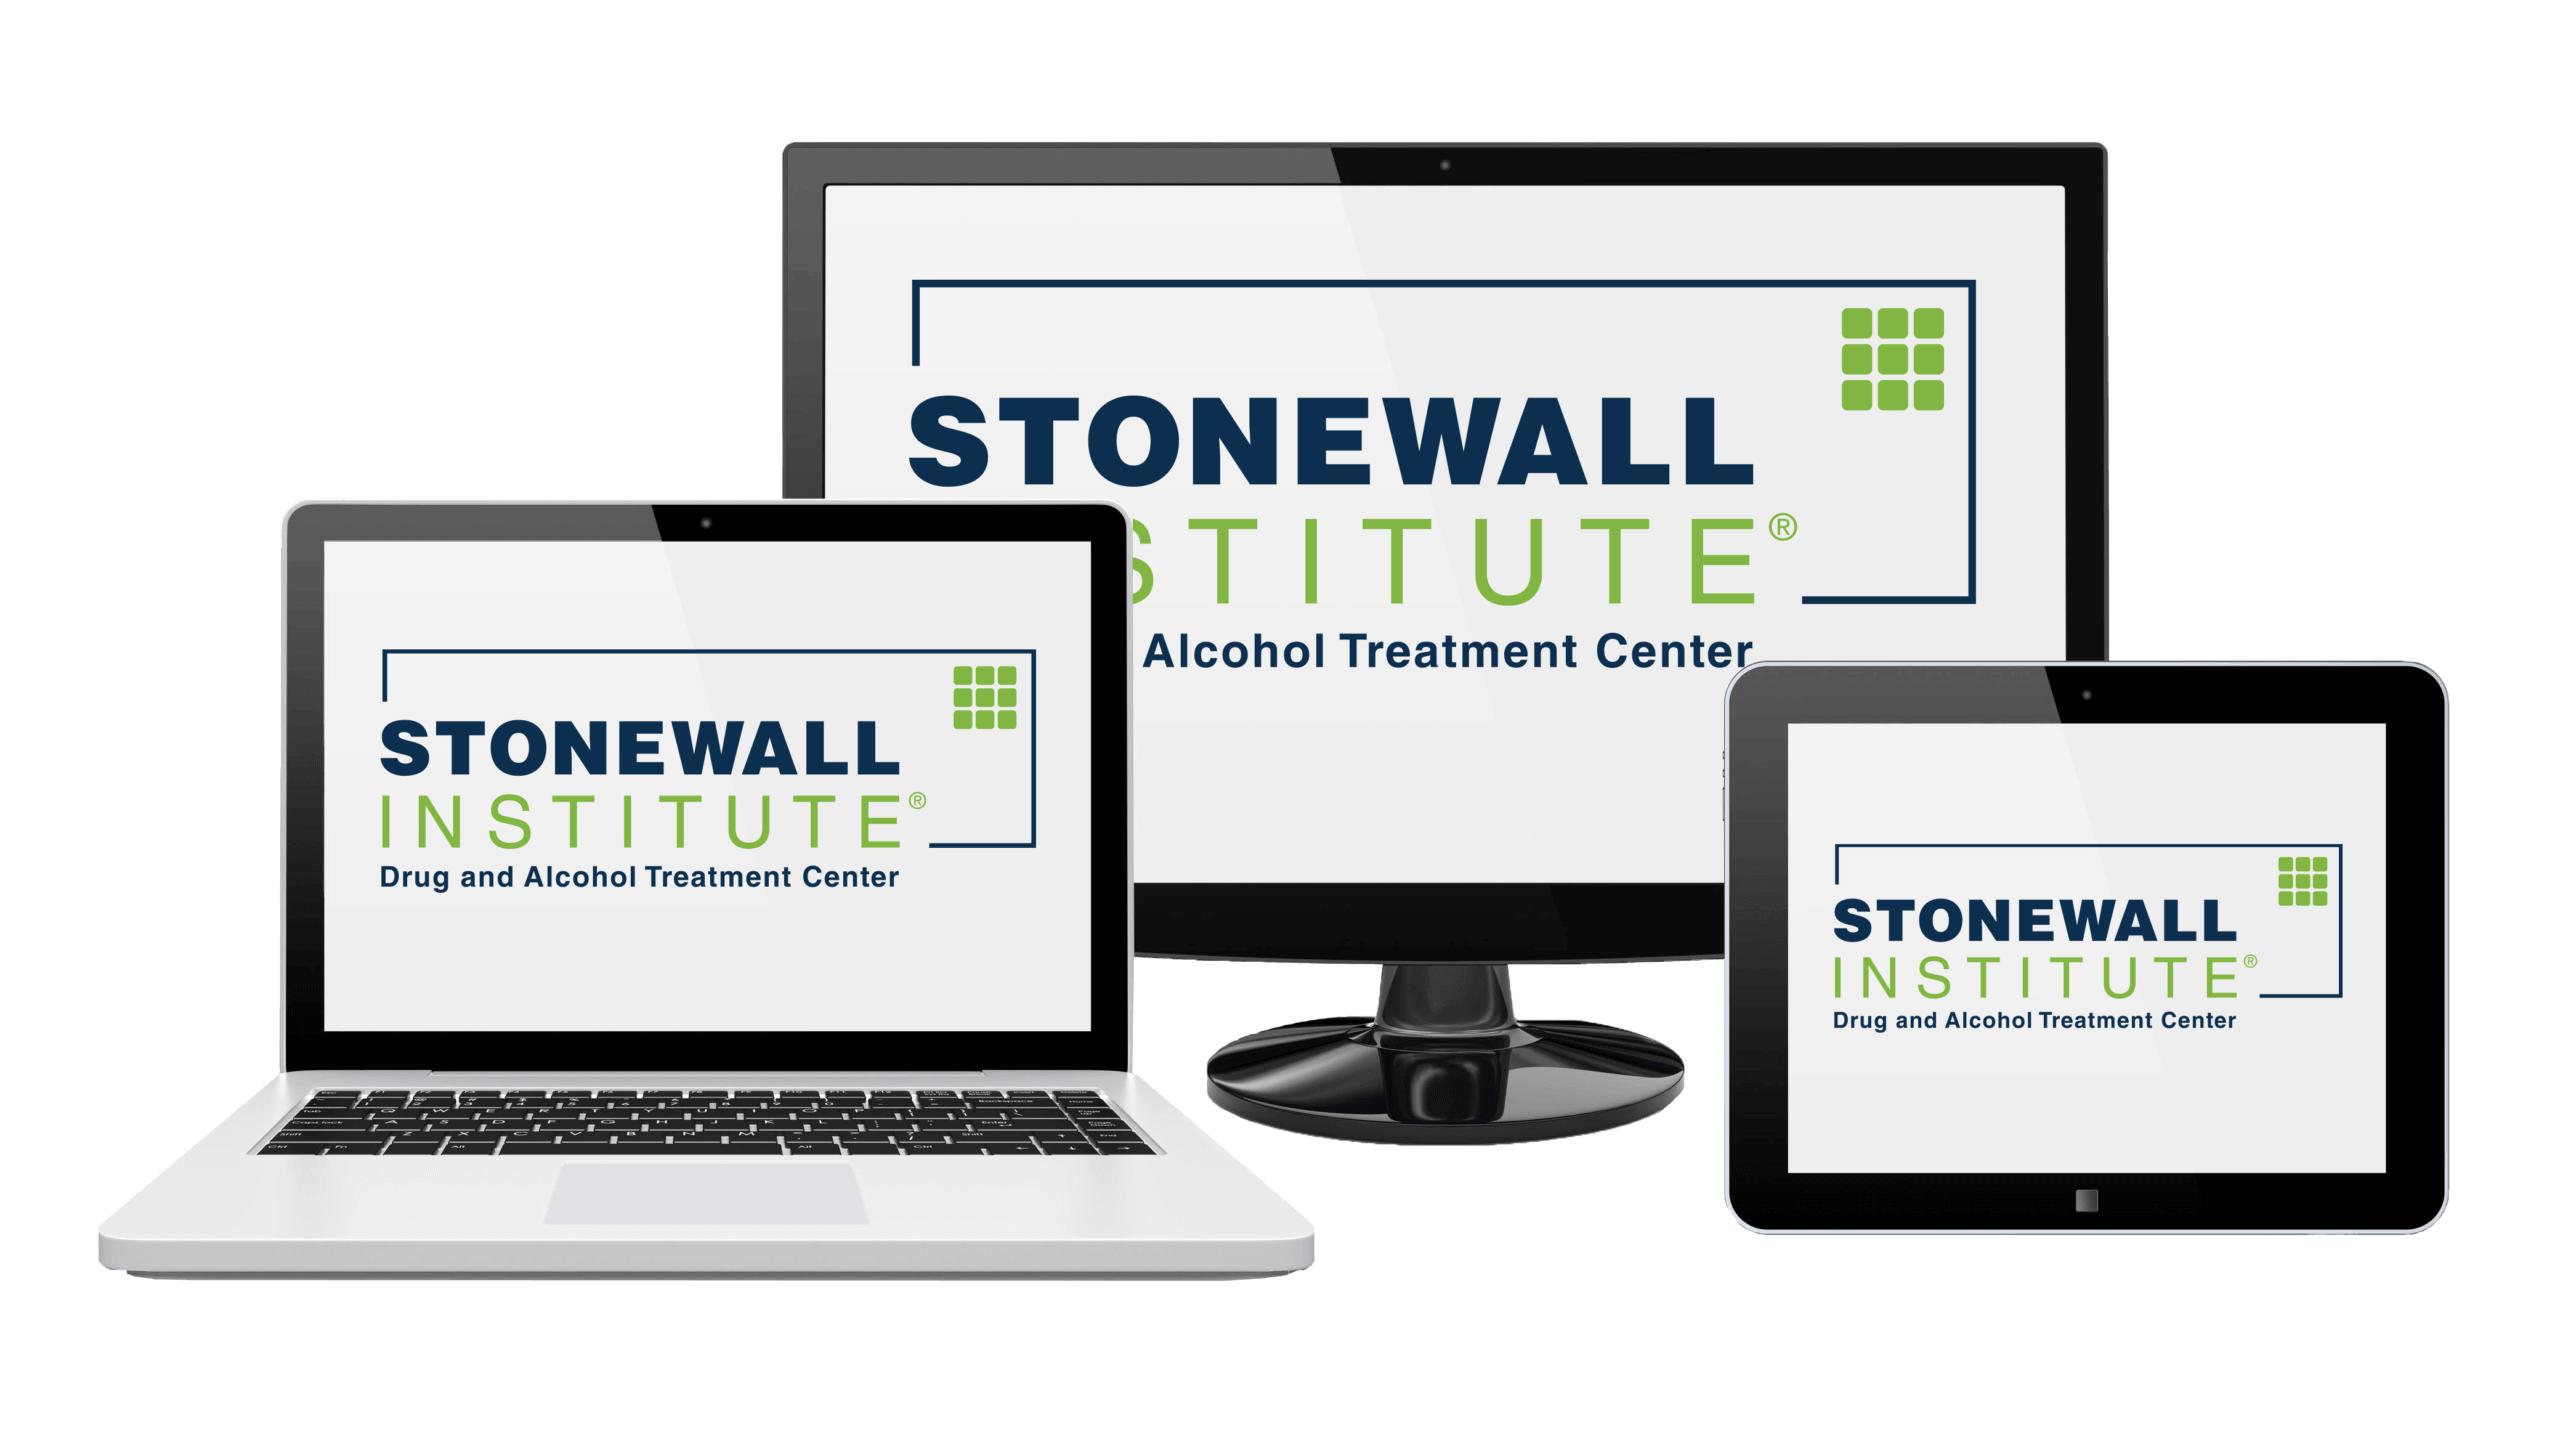 Stonewall Institute Computer